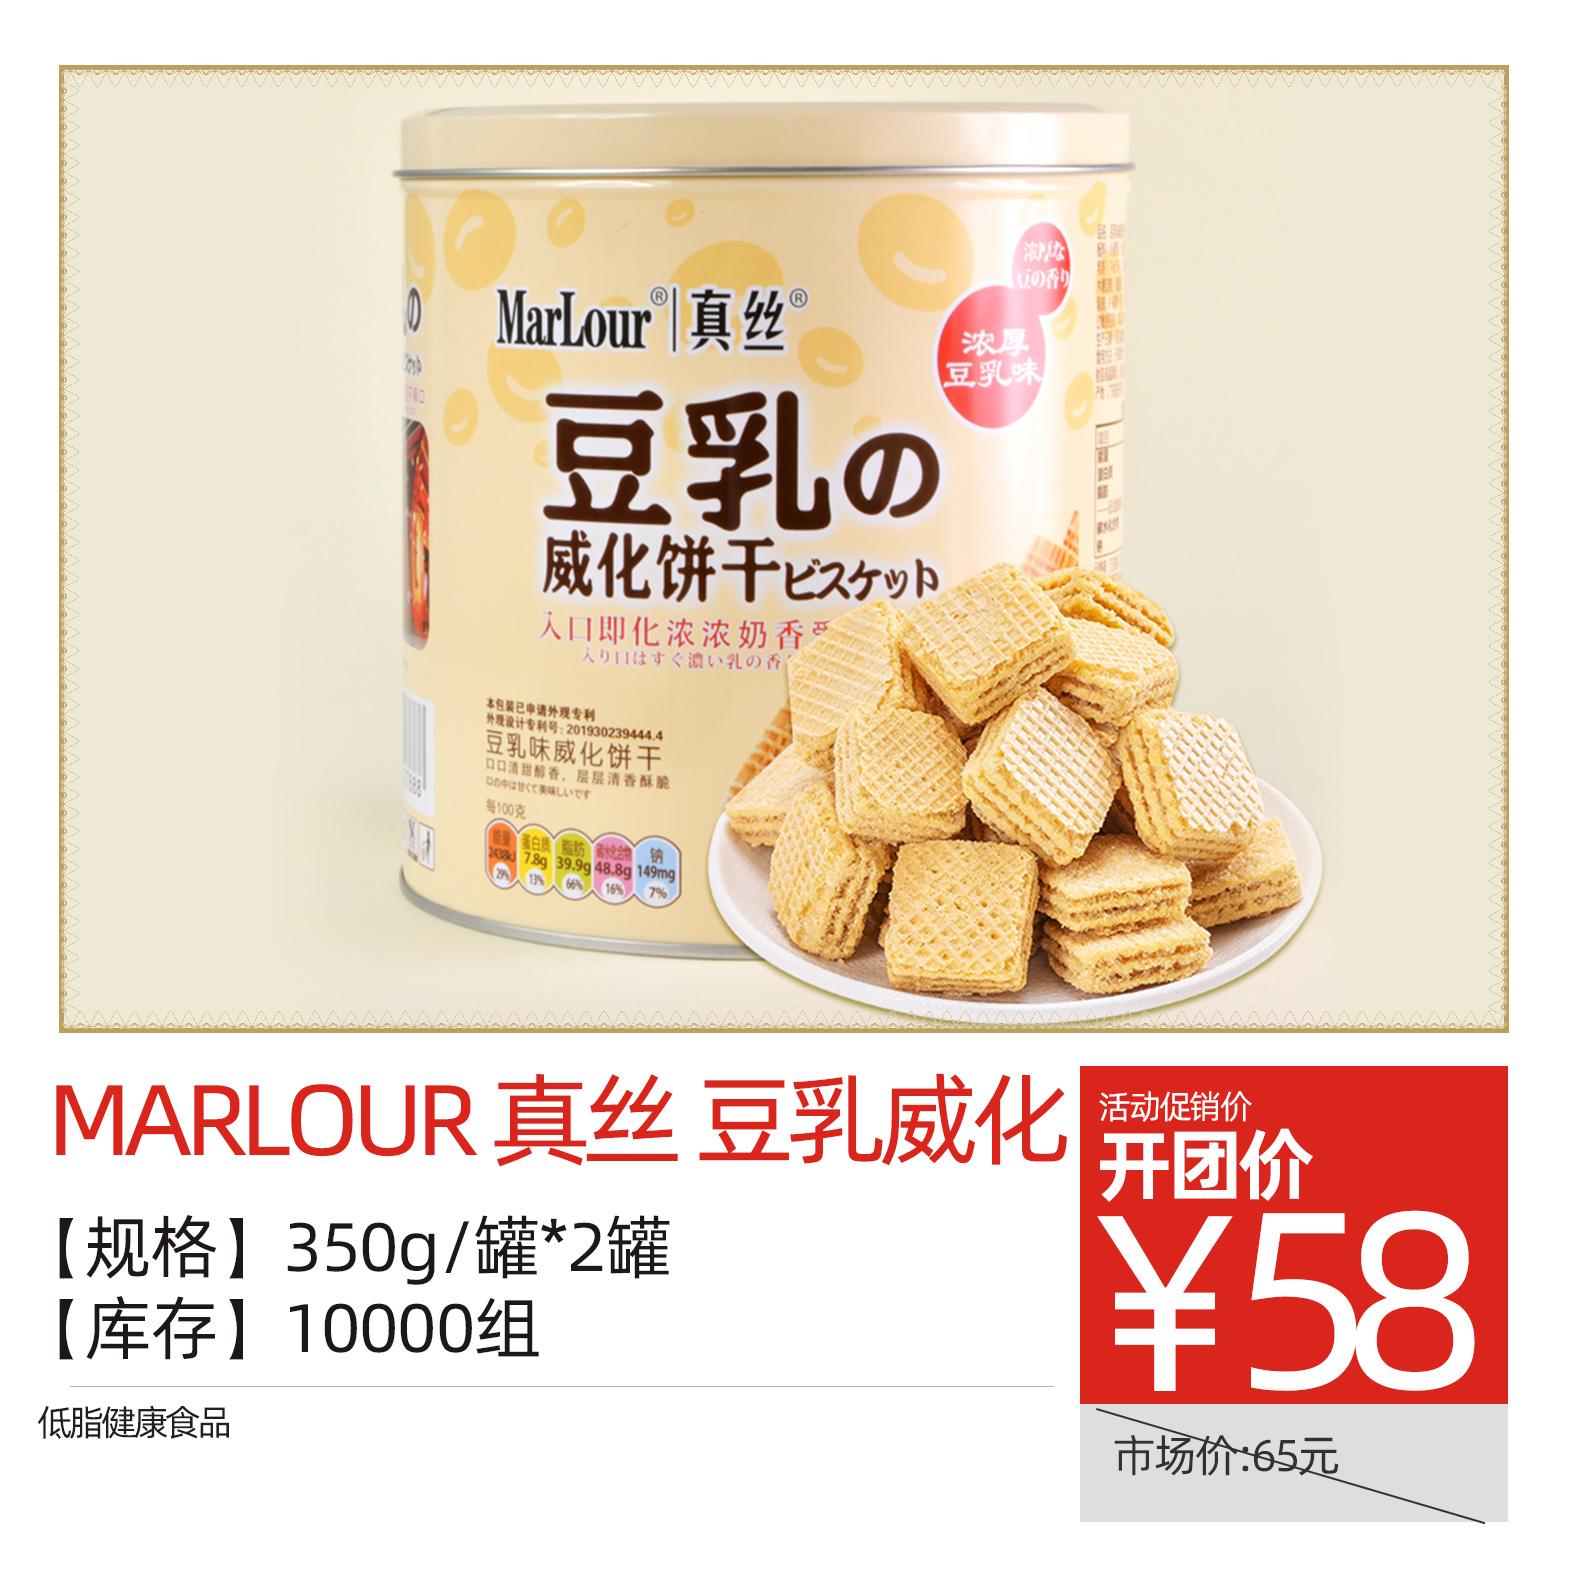 Marlour真丝豆乳威化